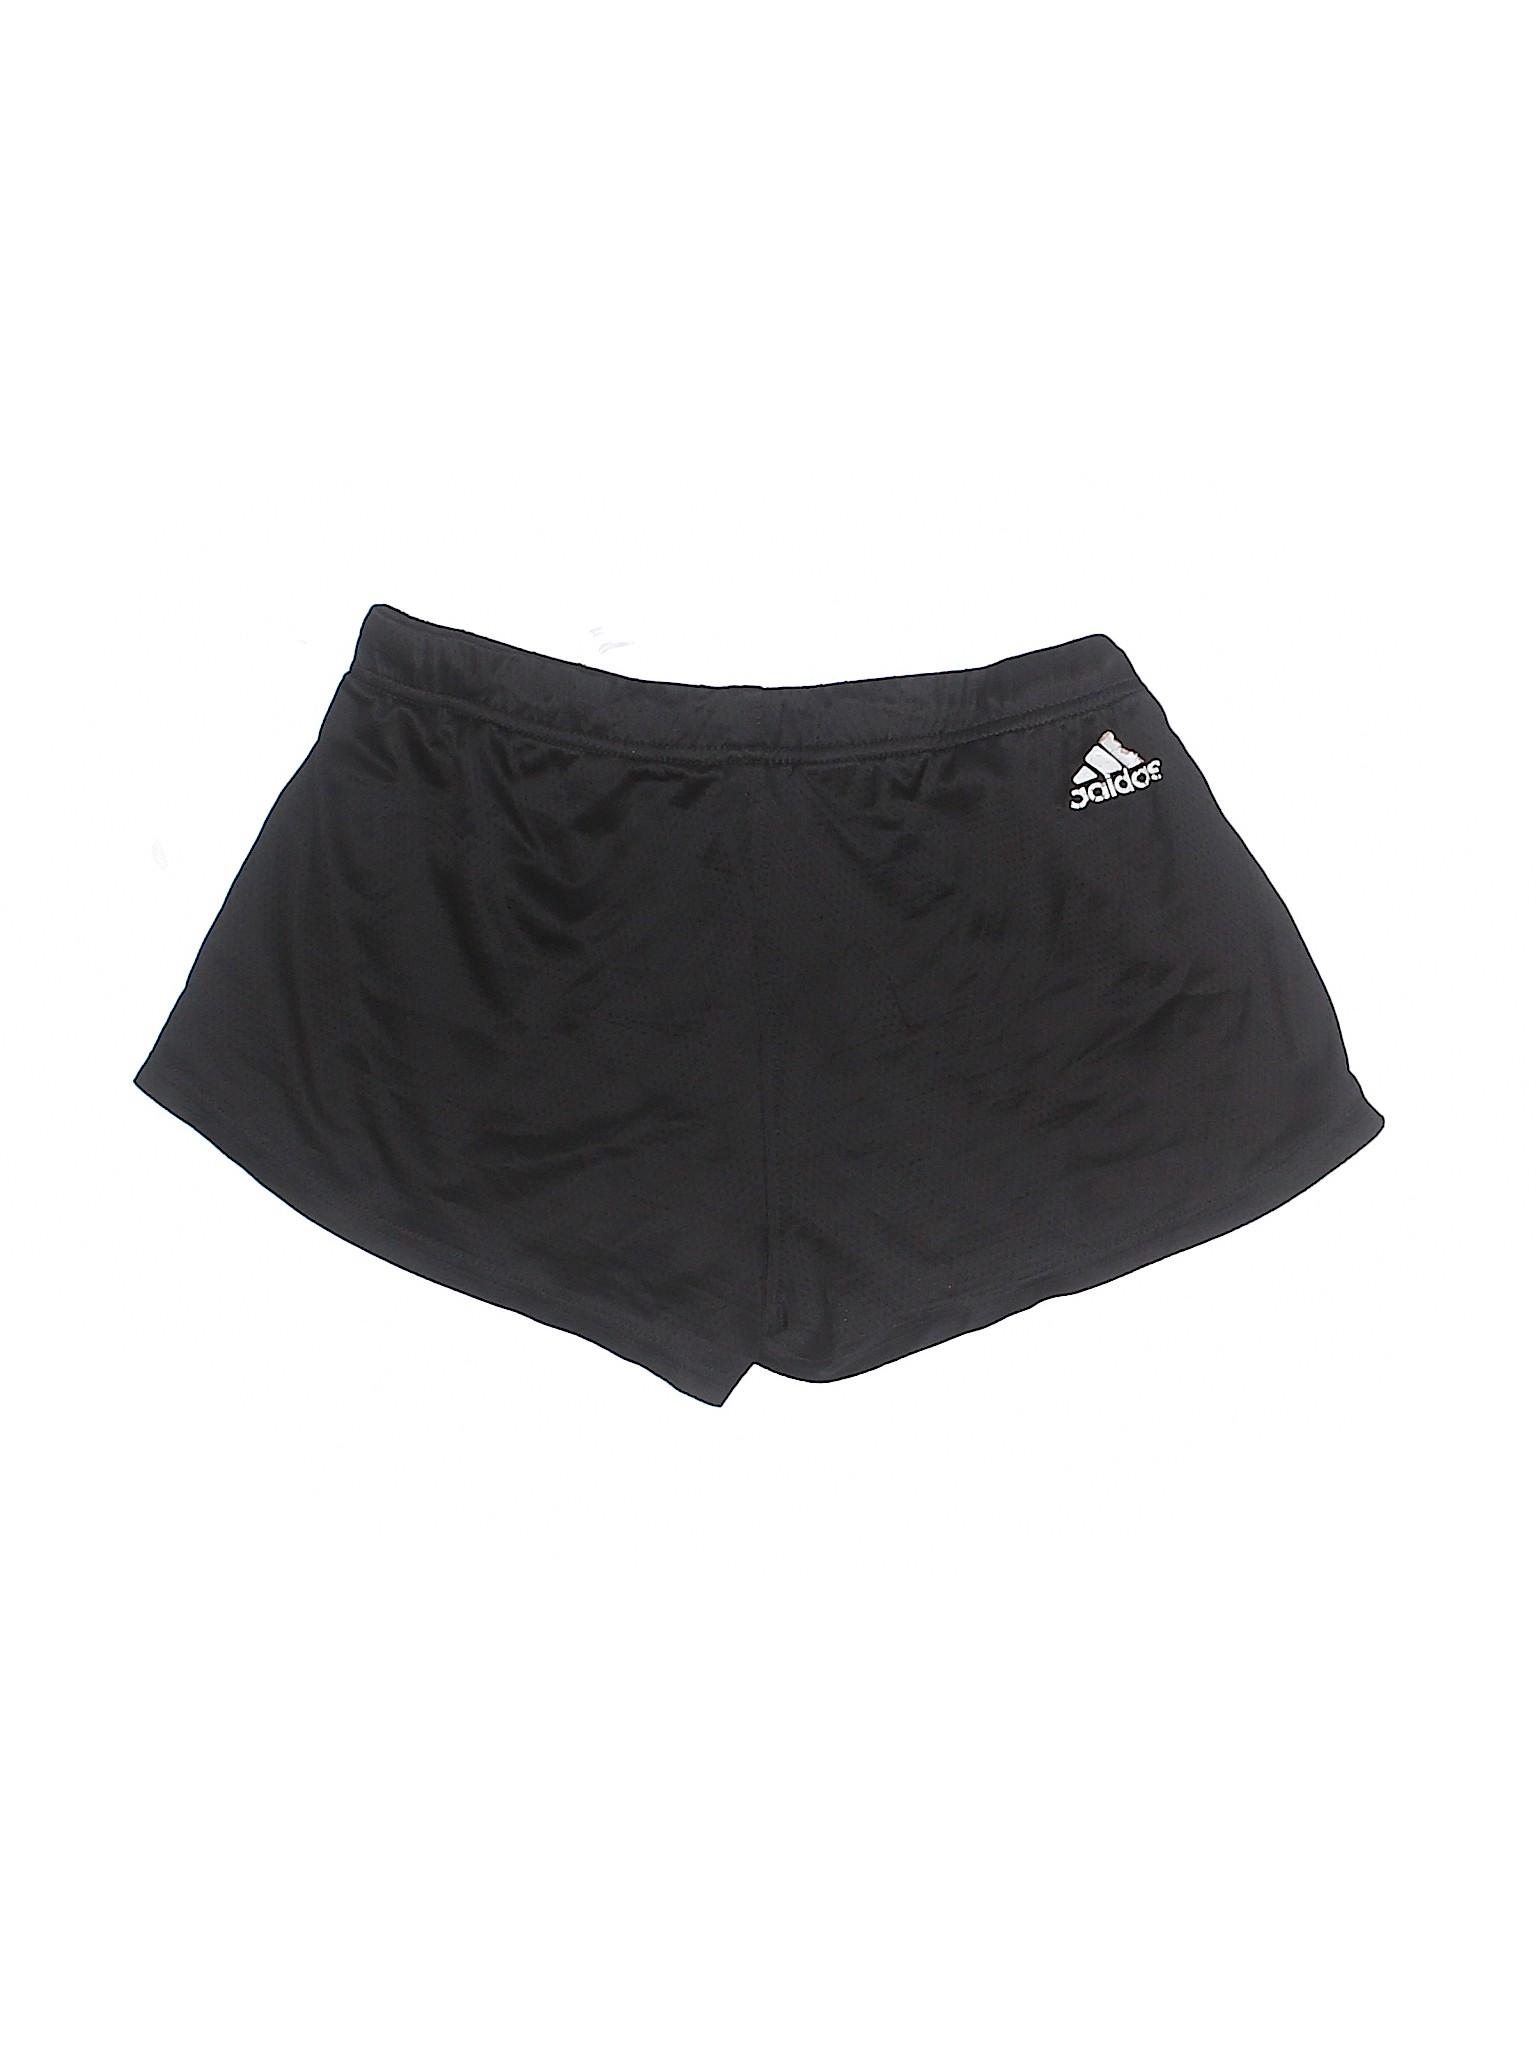 Boutique Adidas Adidas Shorts Shorts Boutique Shorts Boutique Boutique Adidas Adidas qZq4Spw